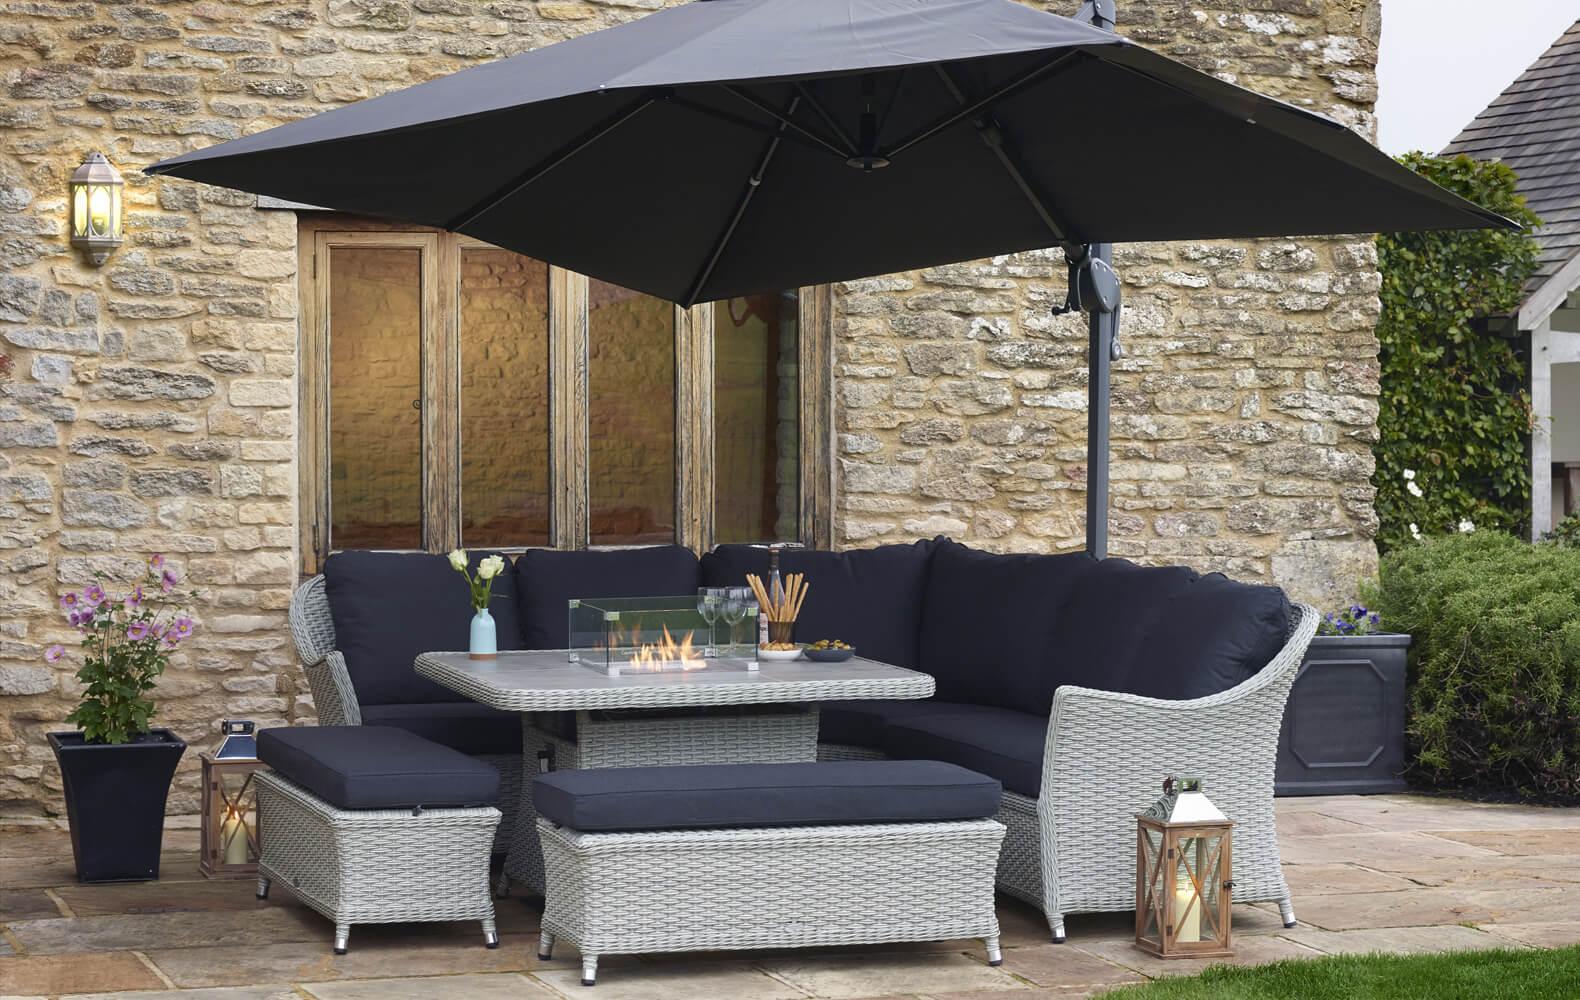 Outdoor Furniture Gazebos Parasols And Accessories Ruxley Manor